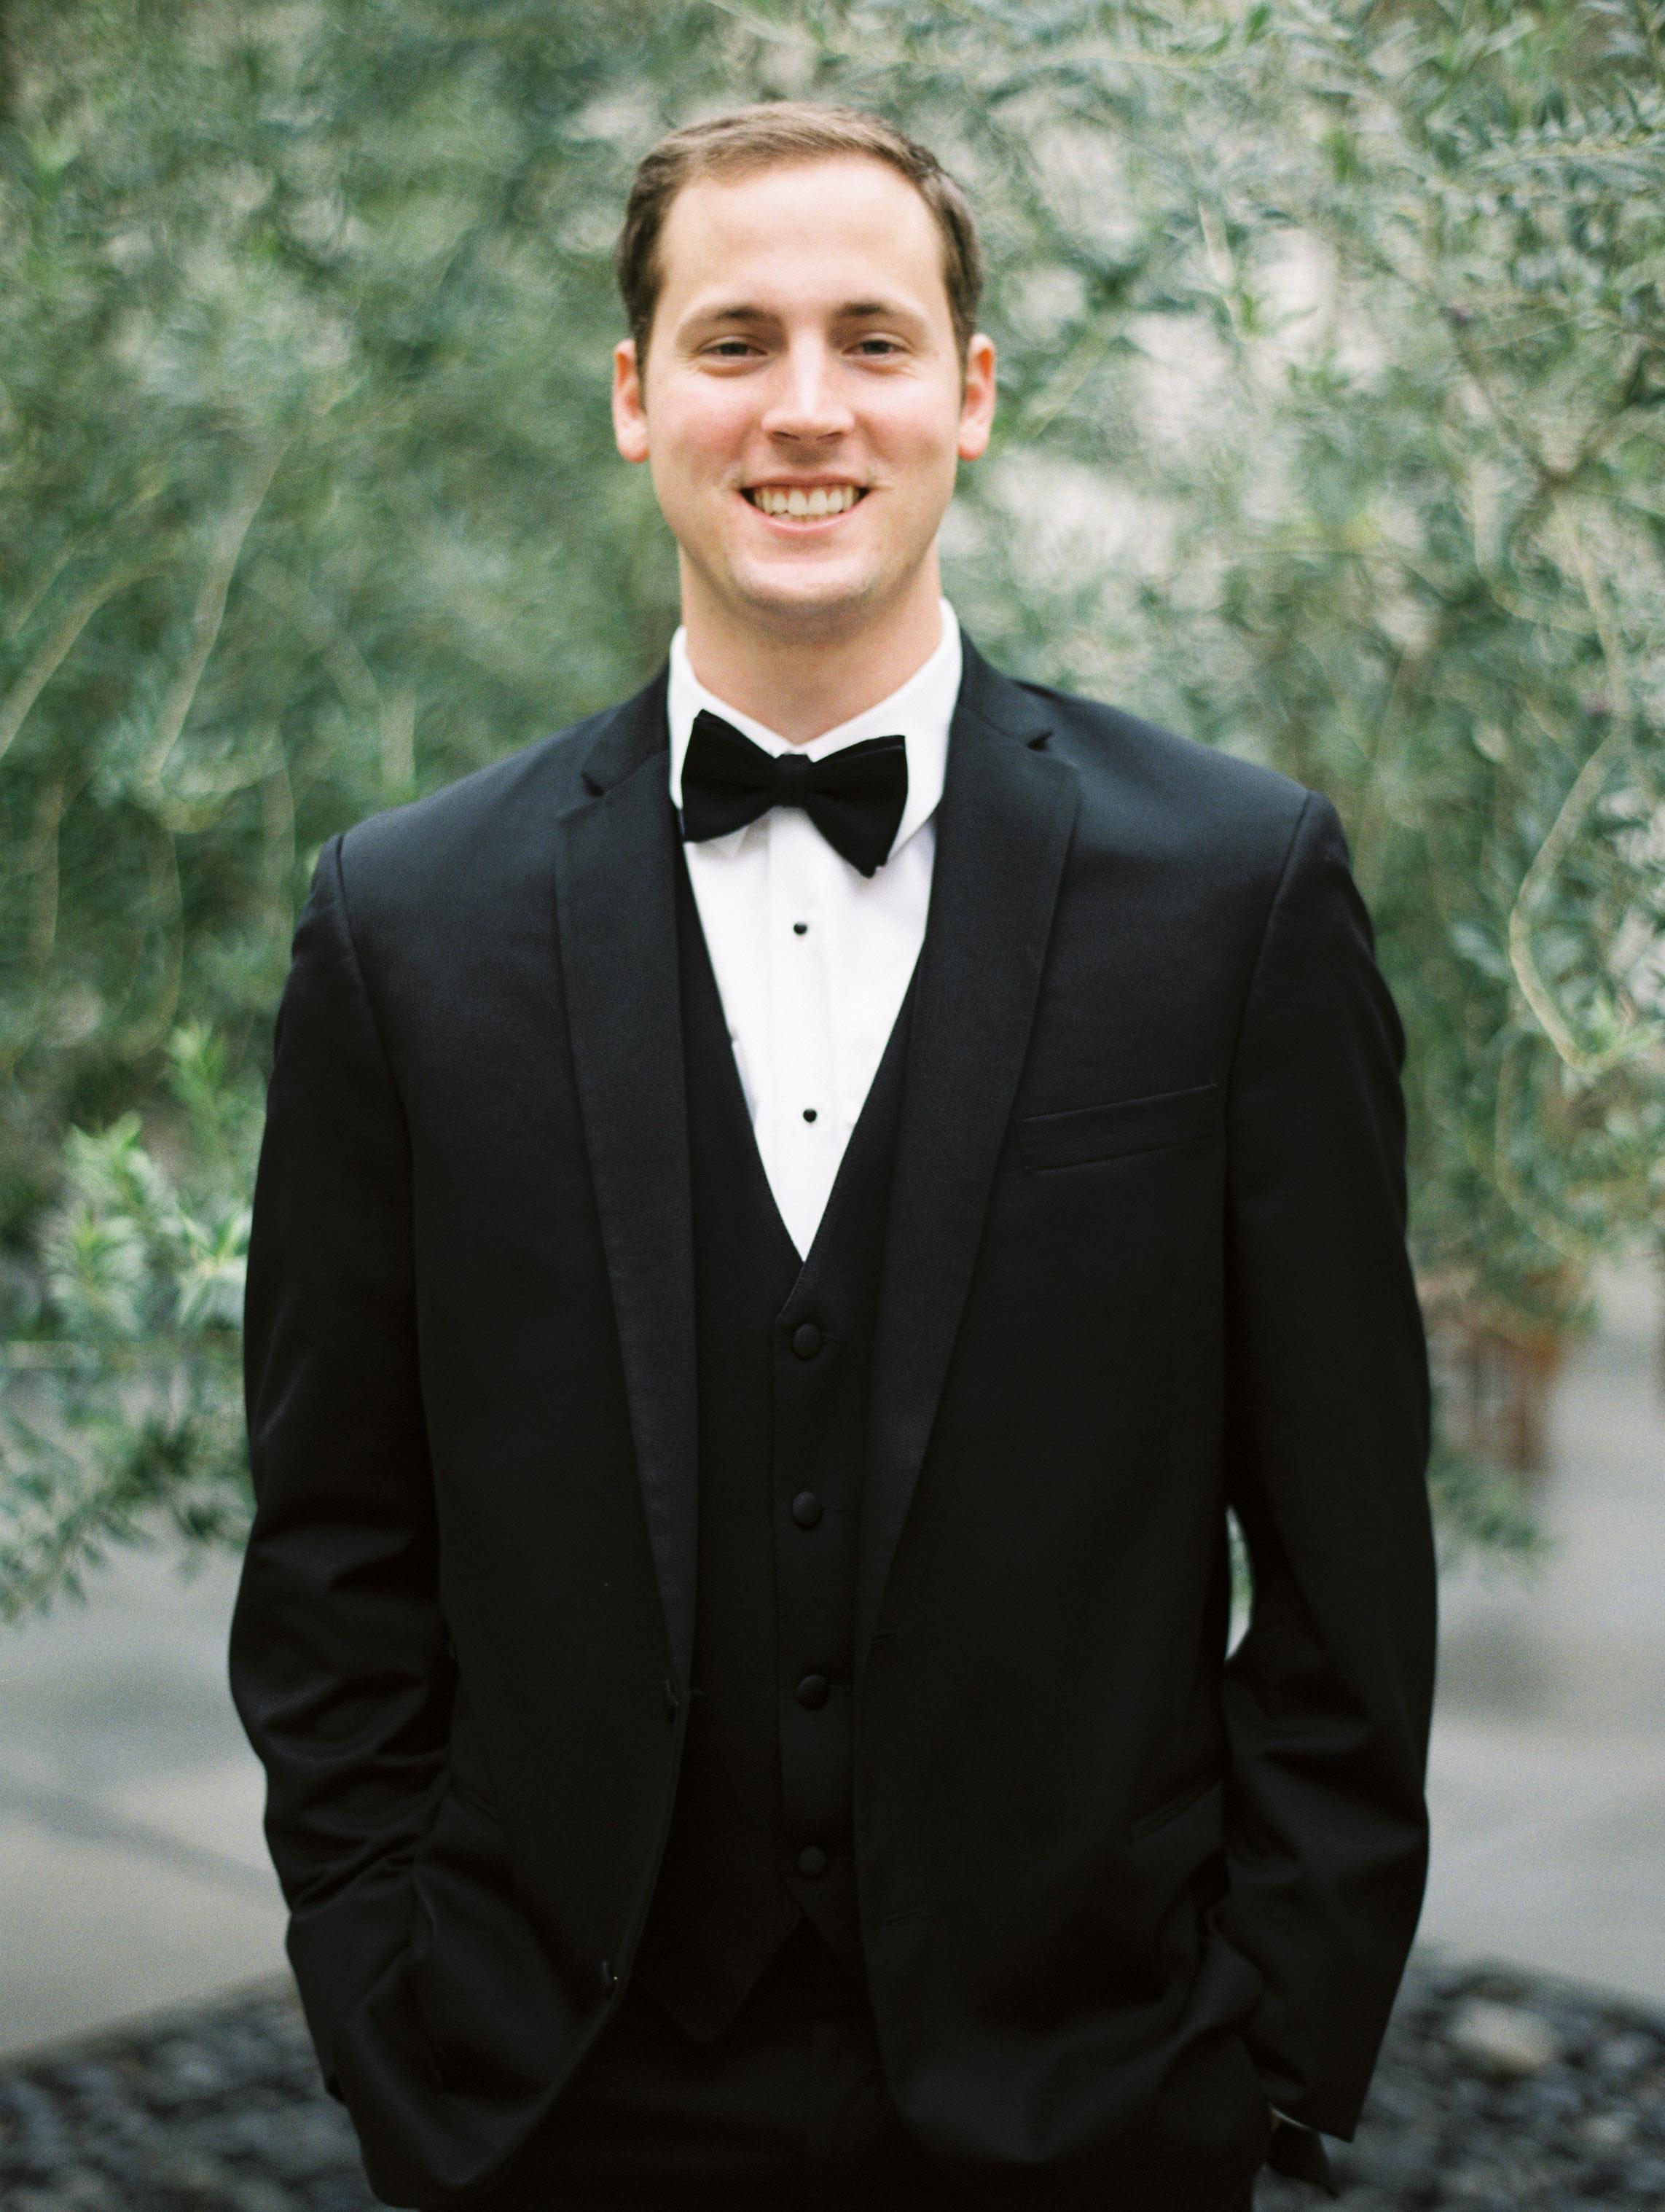 Dana-Fernandez-Photography-Weddings-in-Houston-Magazine-feature-Houston-wedding-photographer-film-21.jpg